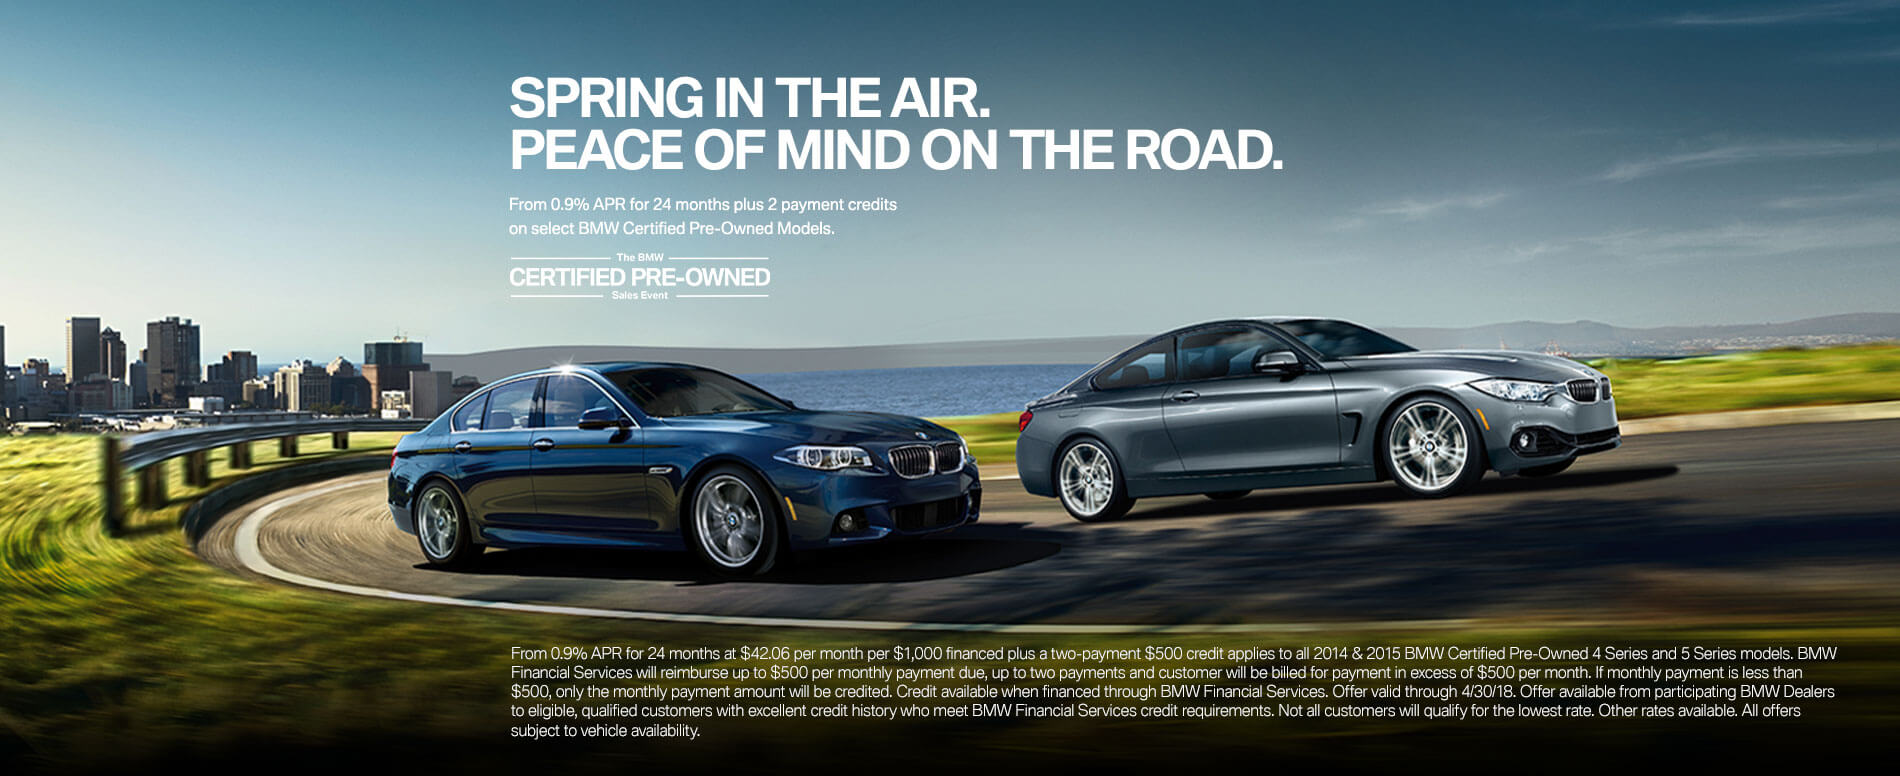 Value Kia Philadelphia >> BMW New & Used Car Dealer - South Jersey & Gloucester ...